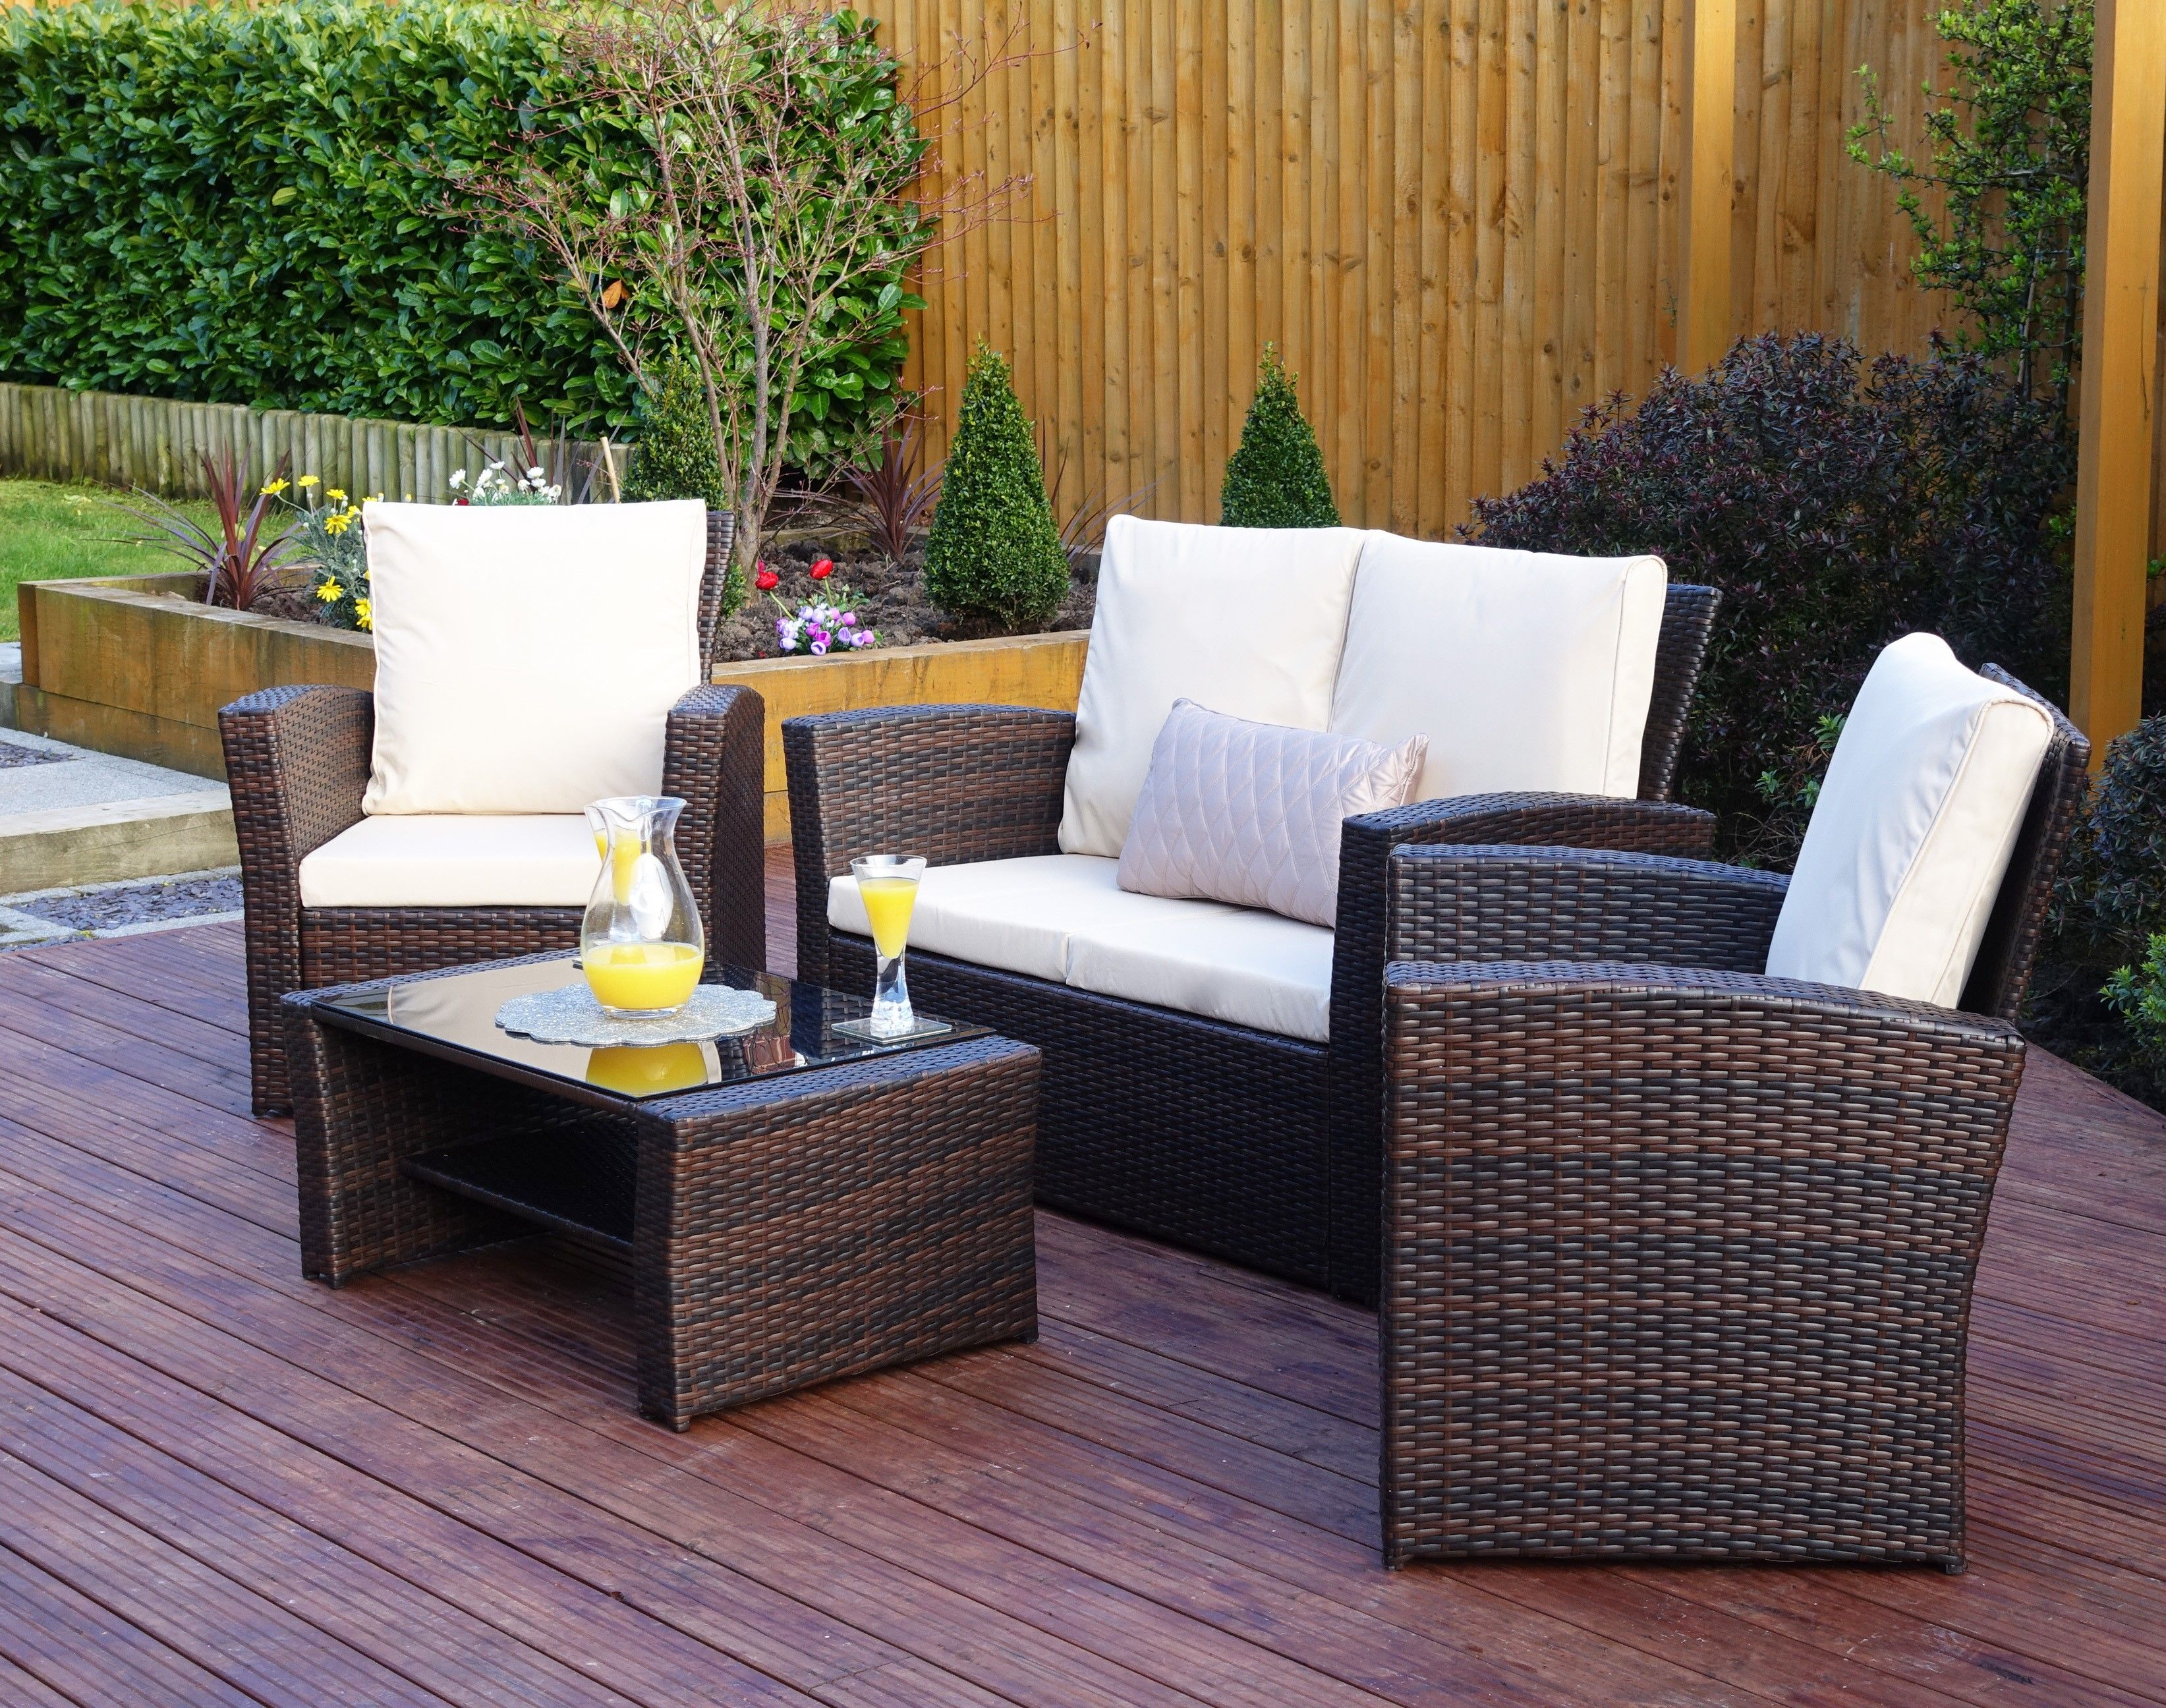 Oxford 4 Piece Brown Rattan Effect Sofa Set Armless Sofas And Chairs Algarve Terrazas Pinterest Garden